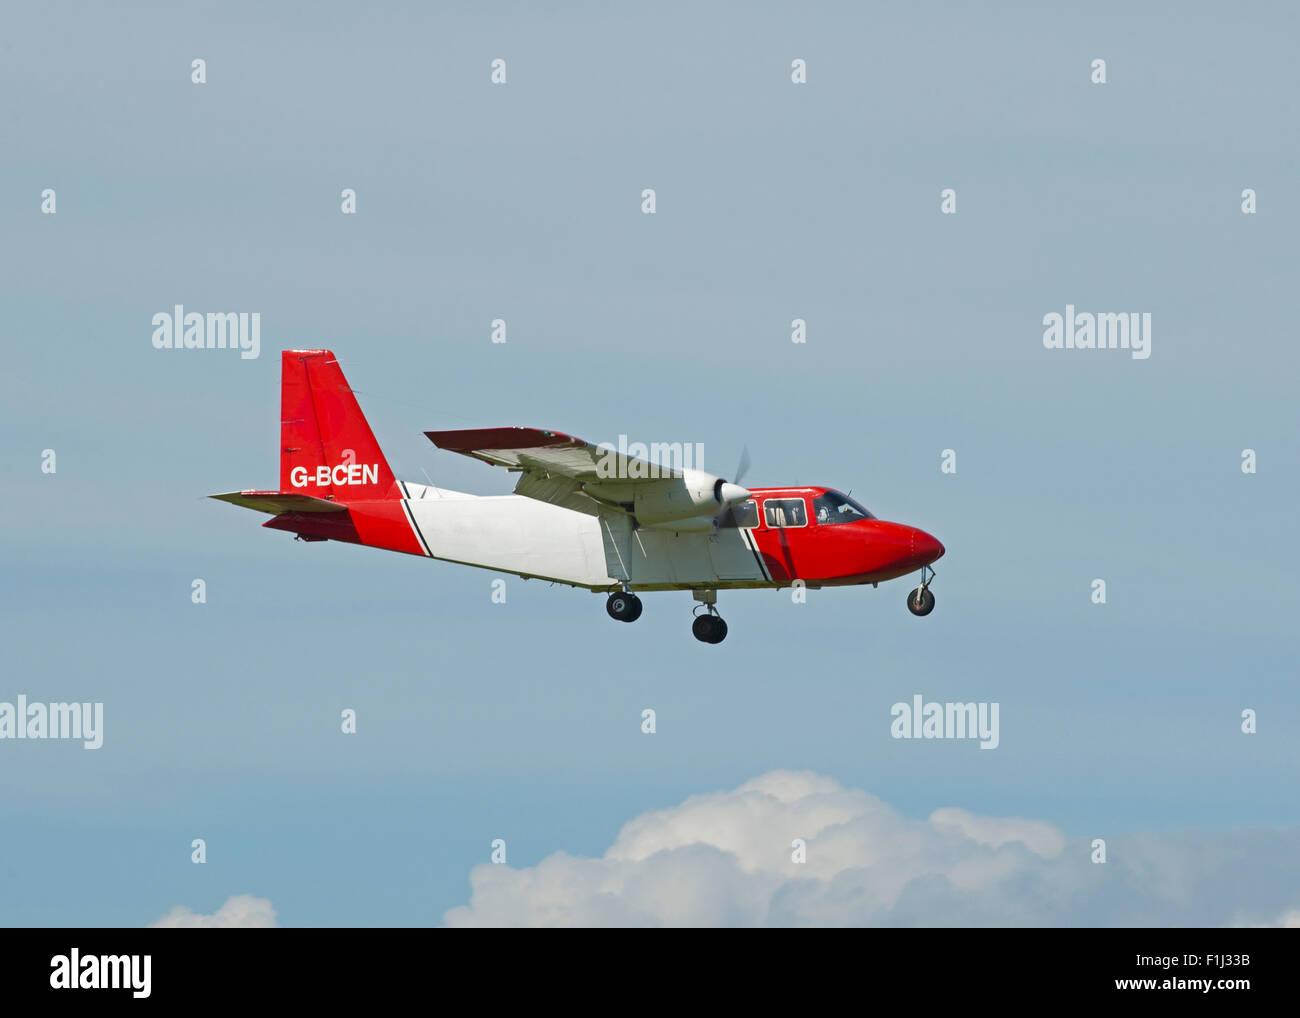 Britten Norman BN-2A-26 Islander (G-BCEN) approaching Inverness Airport. SCO 10,070. - Stock Image